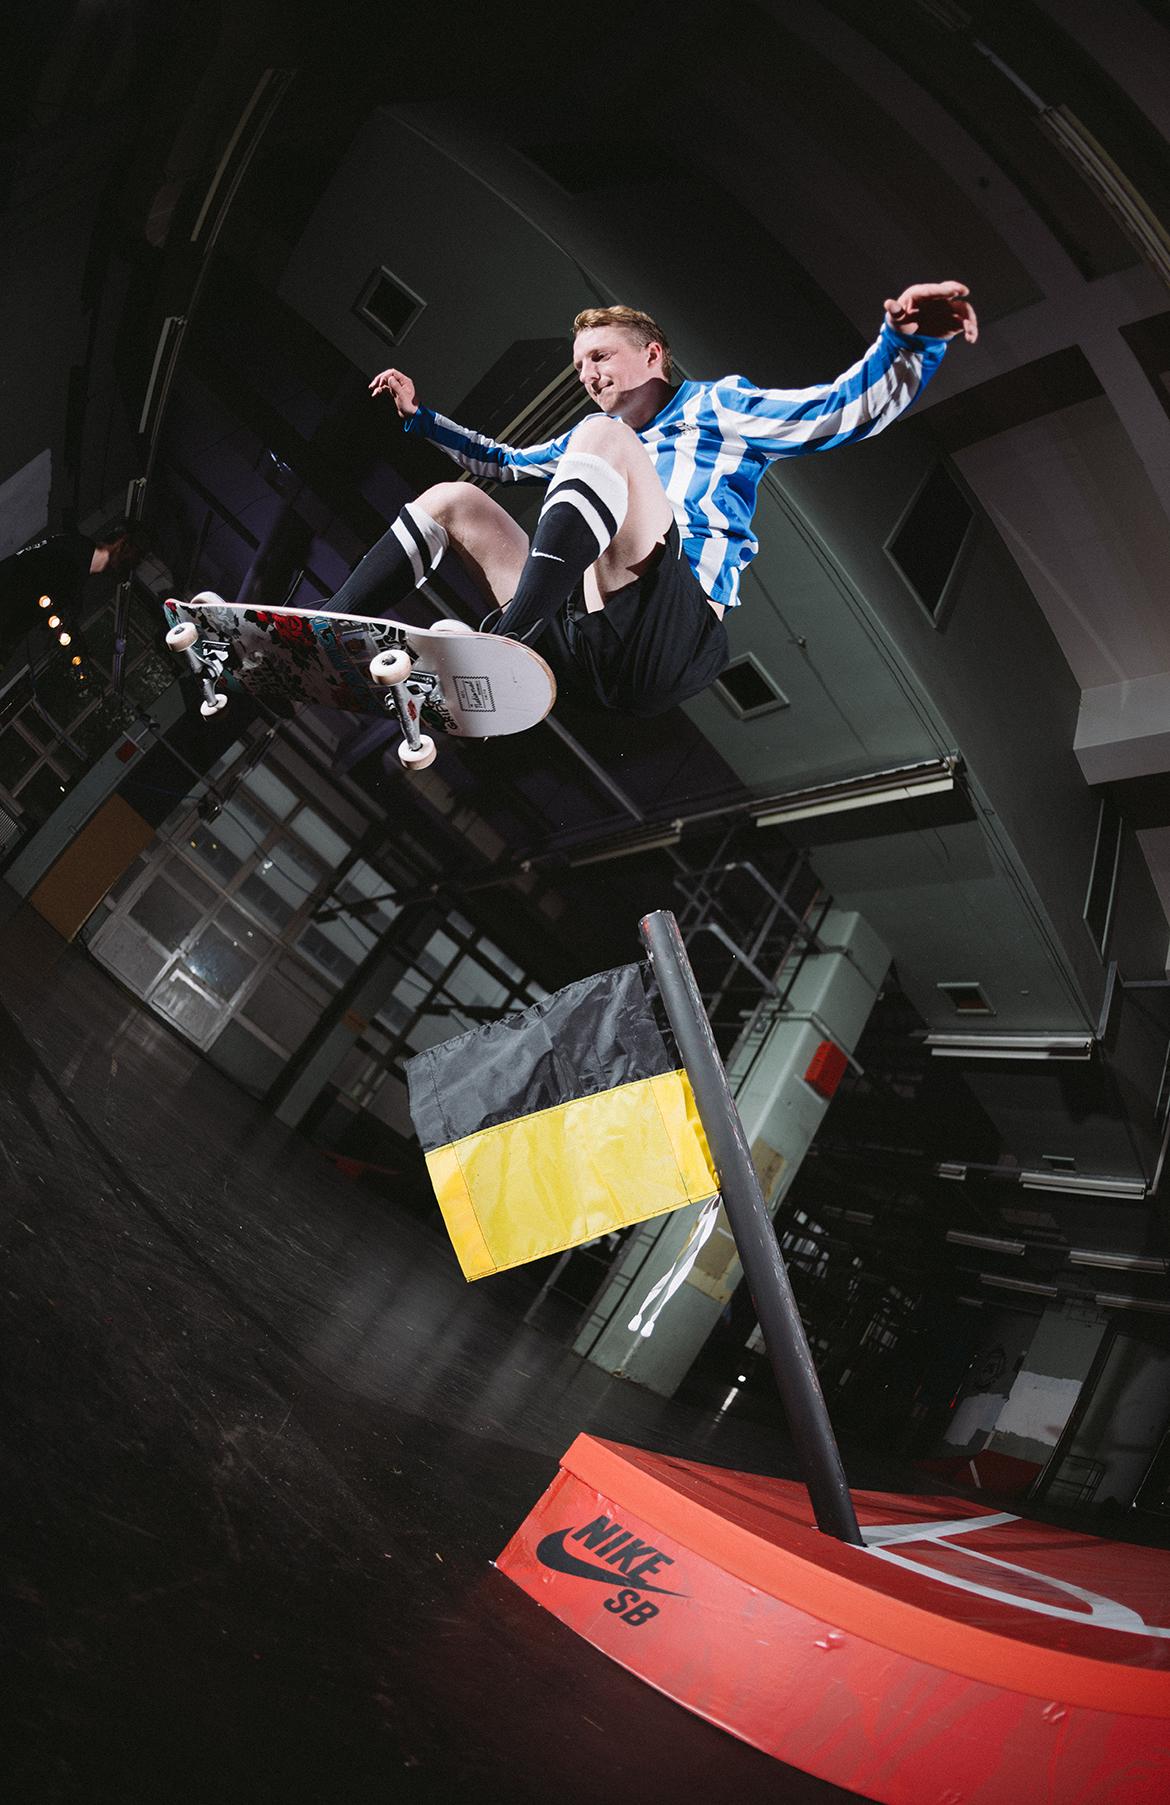 _IHC0312e-Neil-Smith-Polejam-Nike-SB-Risk-Everything-London-2014-Photographer-Maksim-Kalanep.jpg